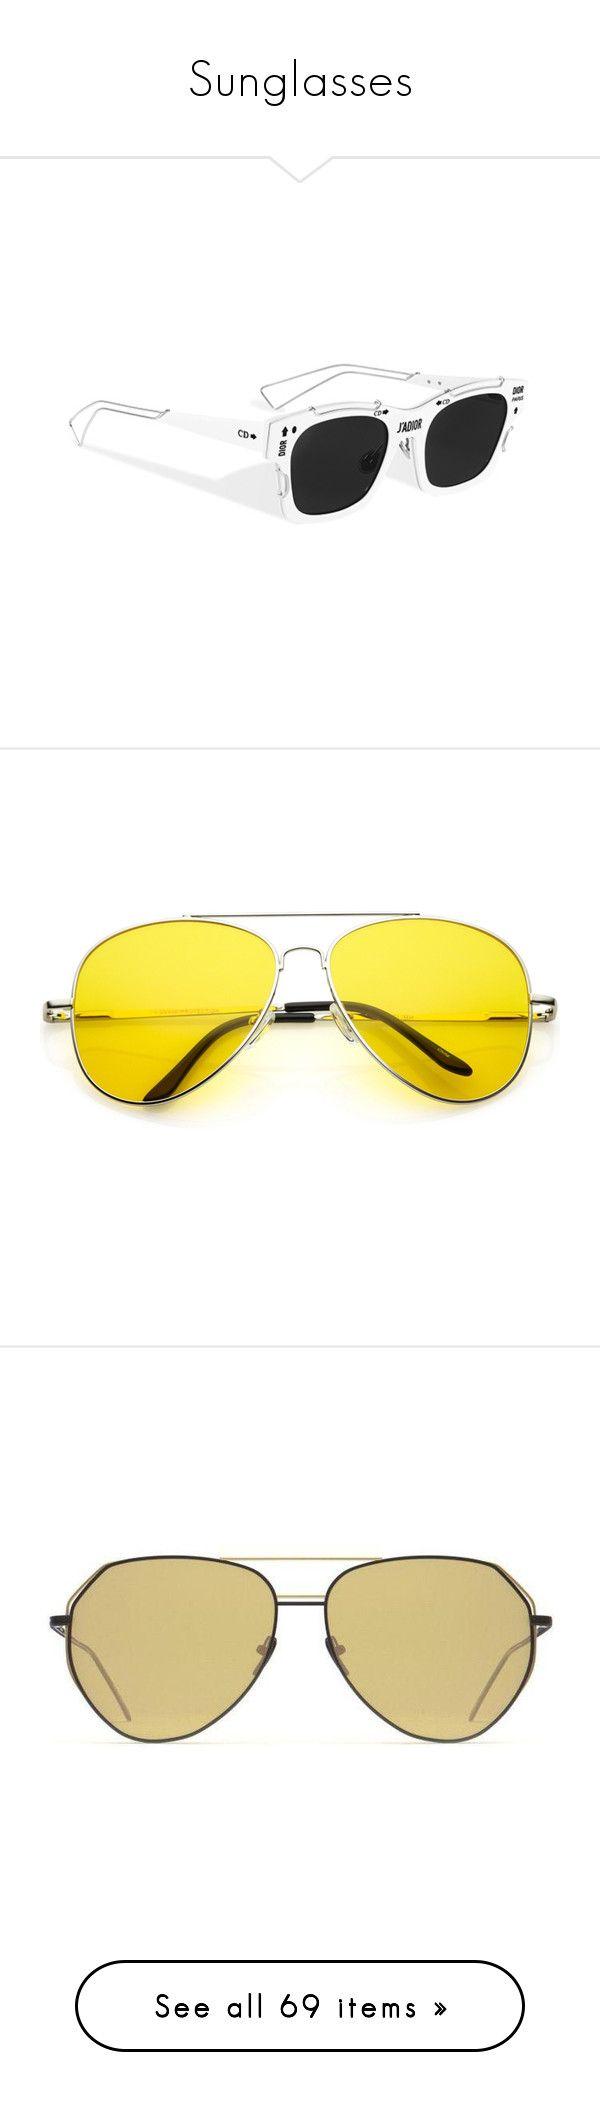 """Sunglasses"" by milenn-h ❤ liked on Polyvore featuring accessories, eyewear, sunglasses, retro sunglasses, star sunglasses, christian dior eyewear, christian dior sunglasses, christian dior, sunglass and yellow aviator sunglasses"